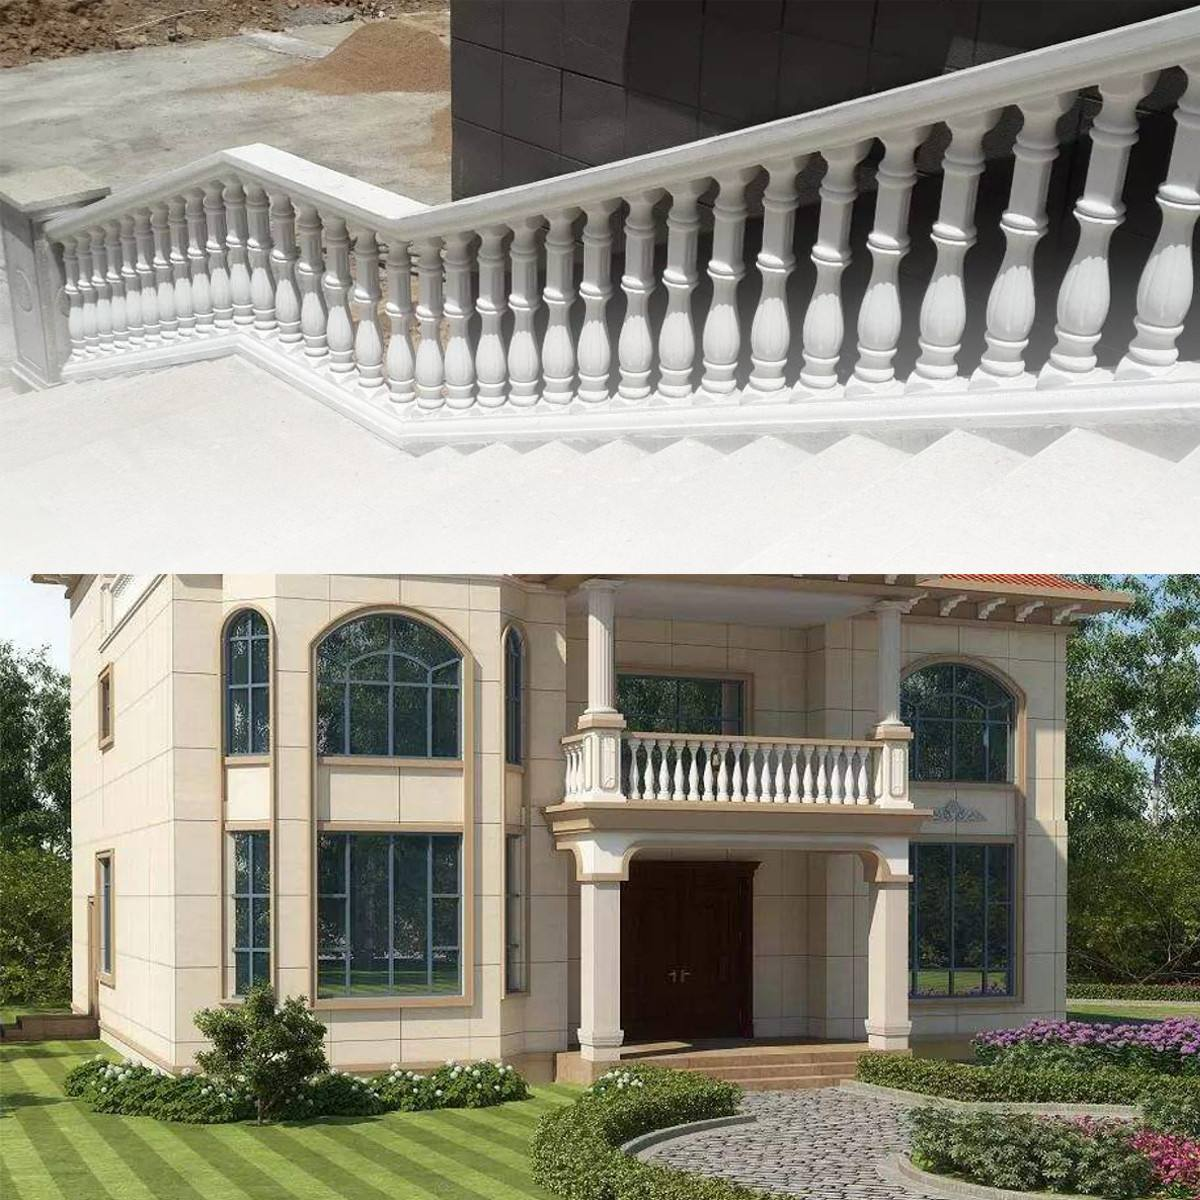 cheapest Drop Ship Stone Paving Mold Concrete Stepping Walkway Paver 9 Grids DIY Driveway Garden